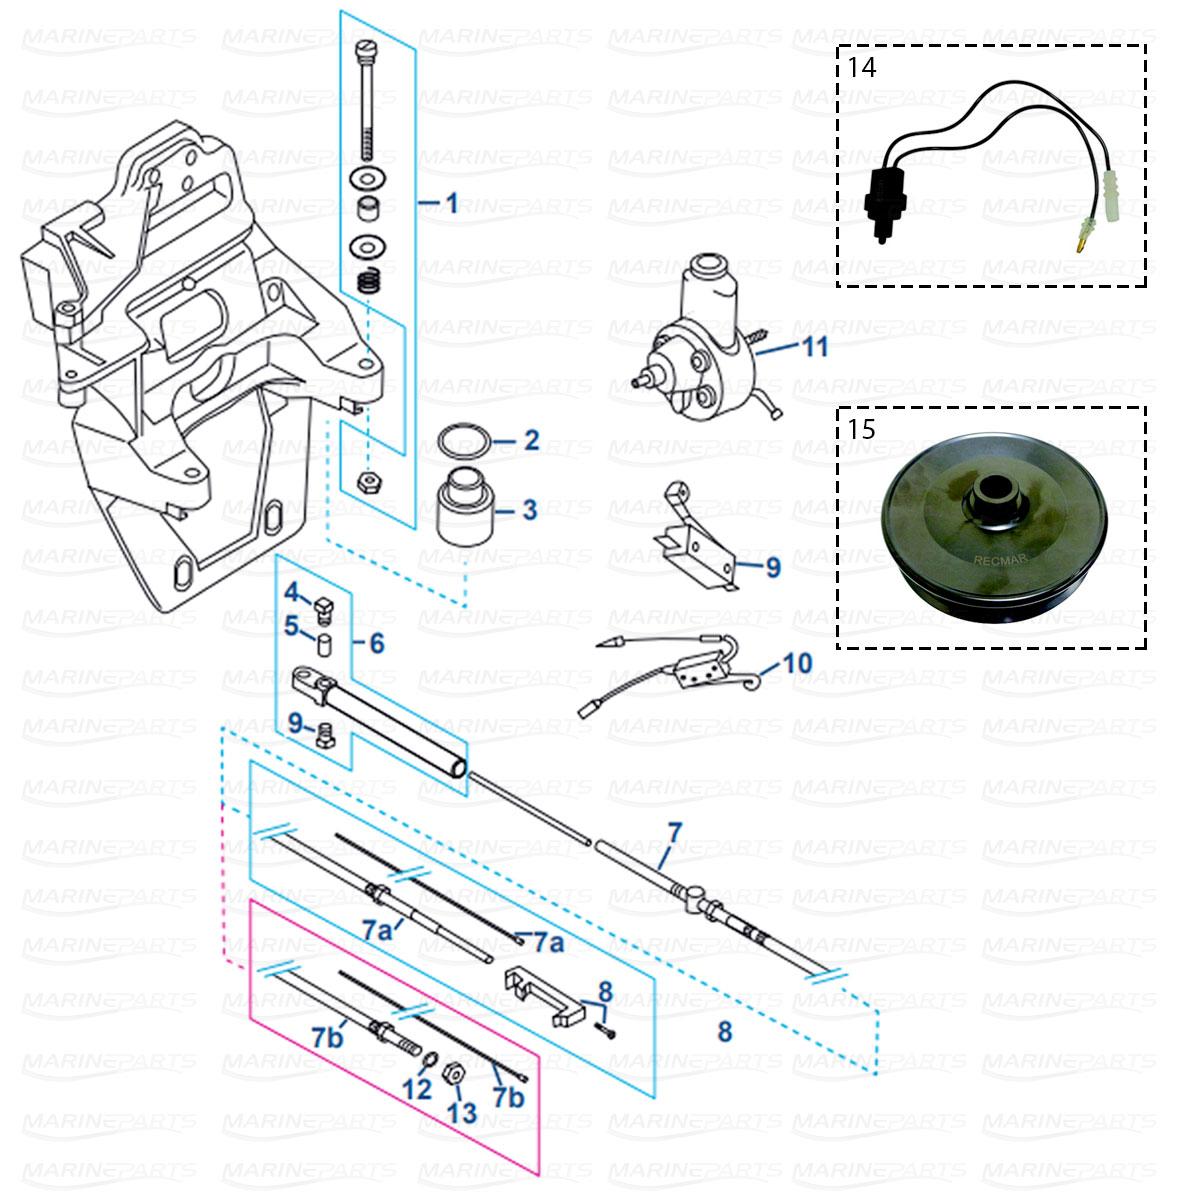 Transom Plate, Shift Cable, Power Steering Pump MerCruiser Alpha/Bravo